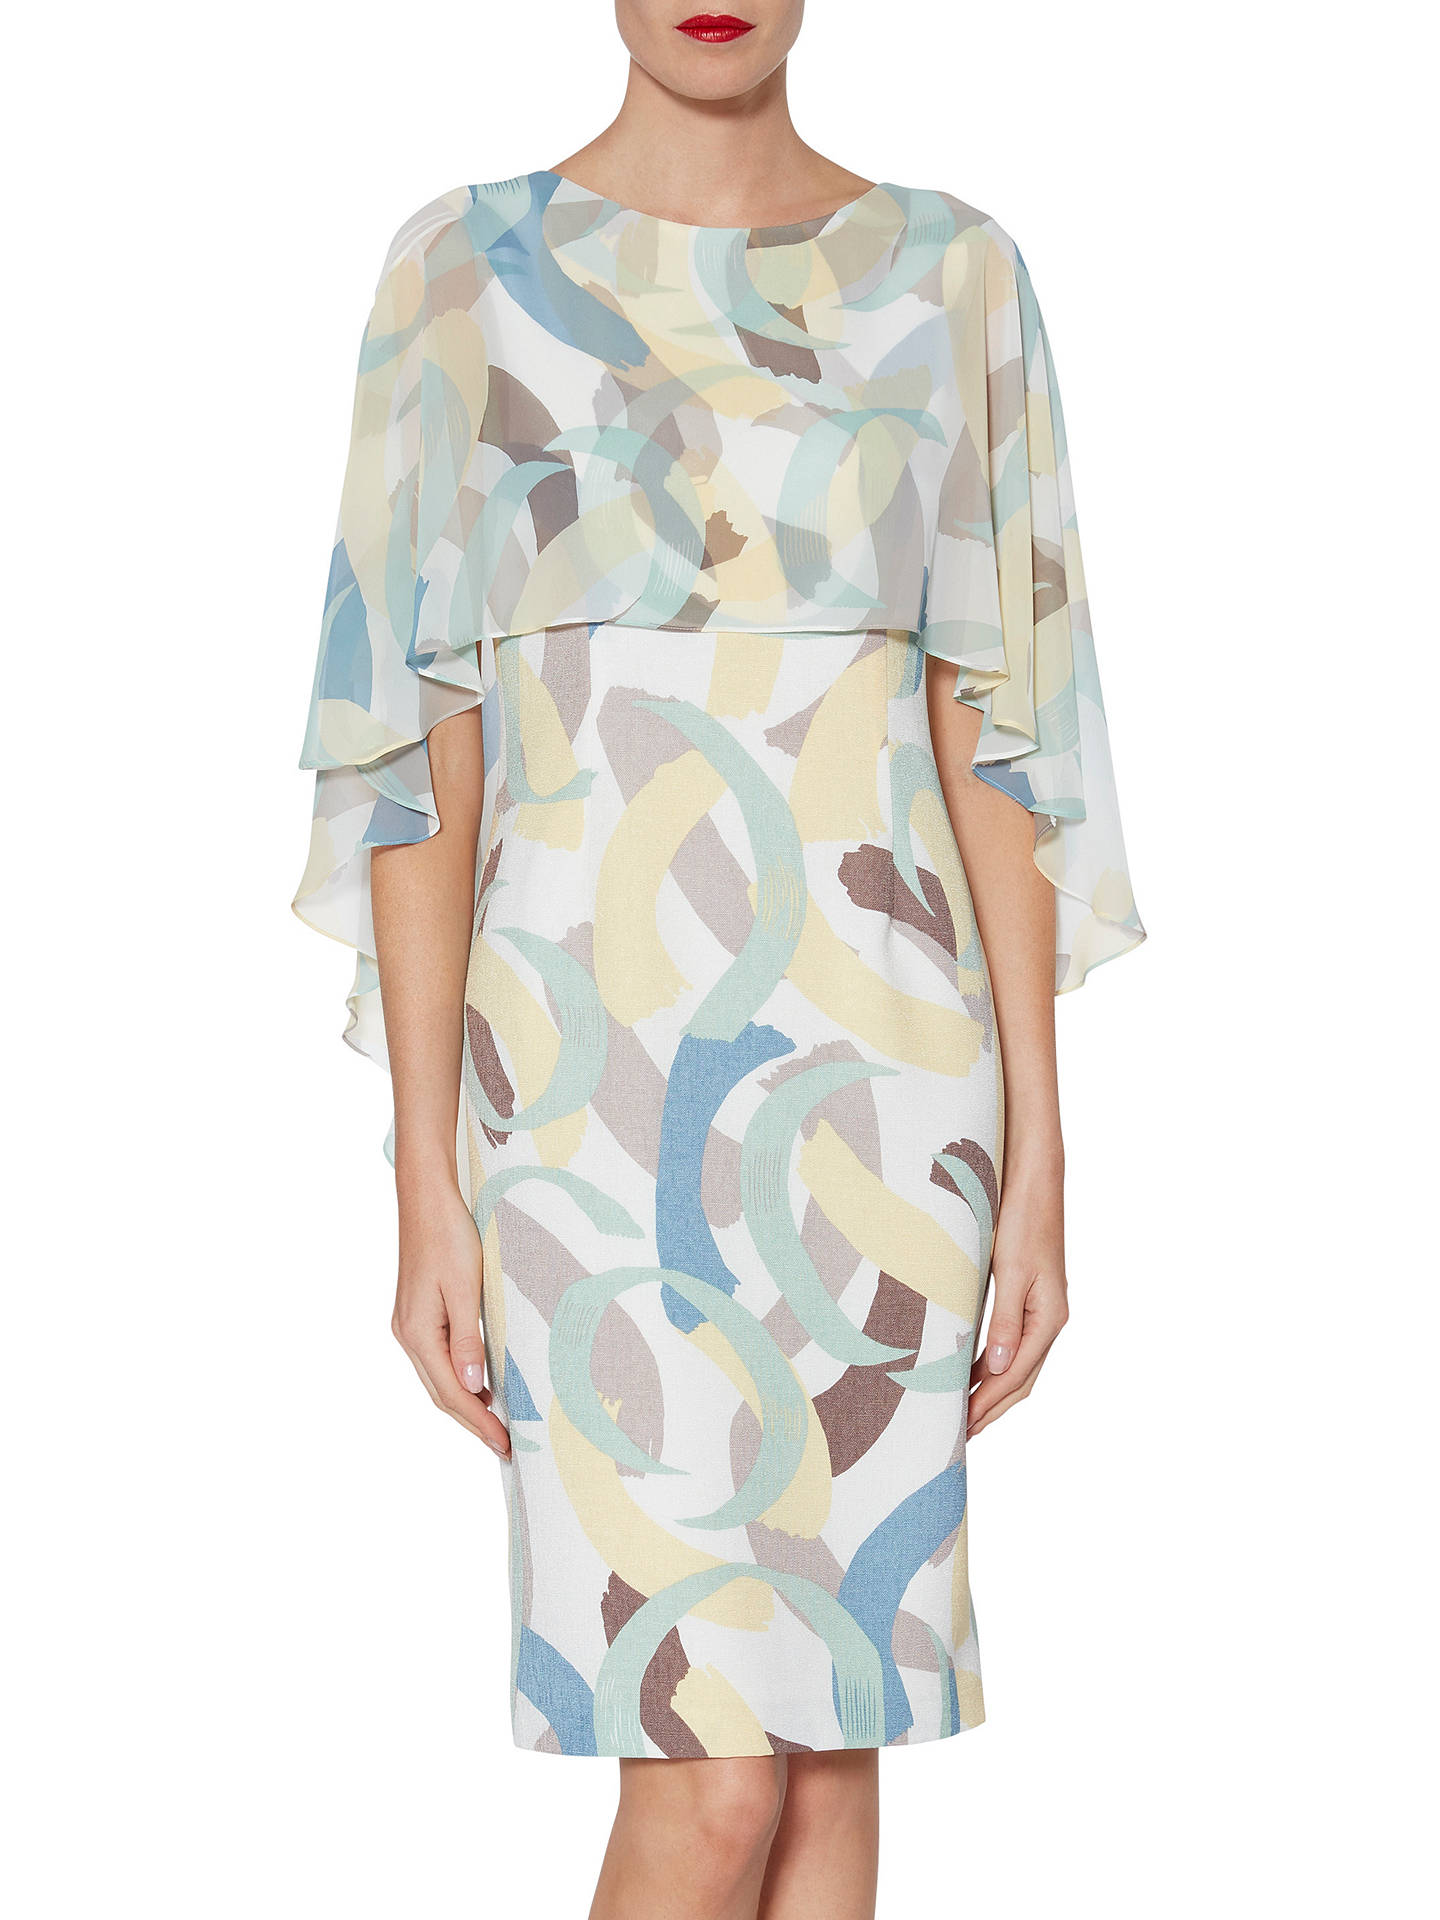 671d2543c7 Gina Bacconi Maisie Dress and Cape, Multi